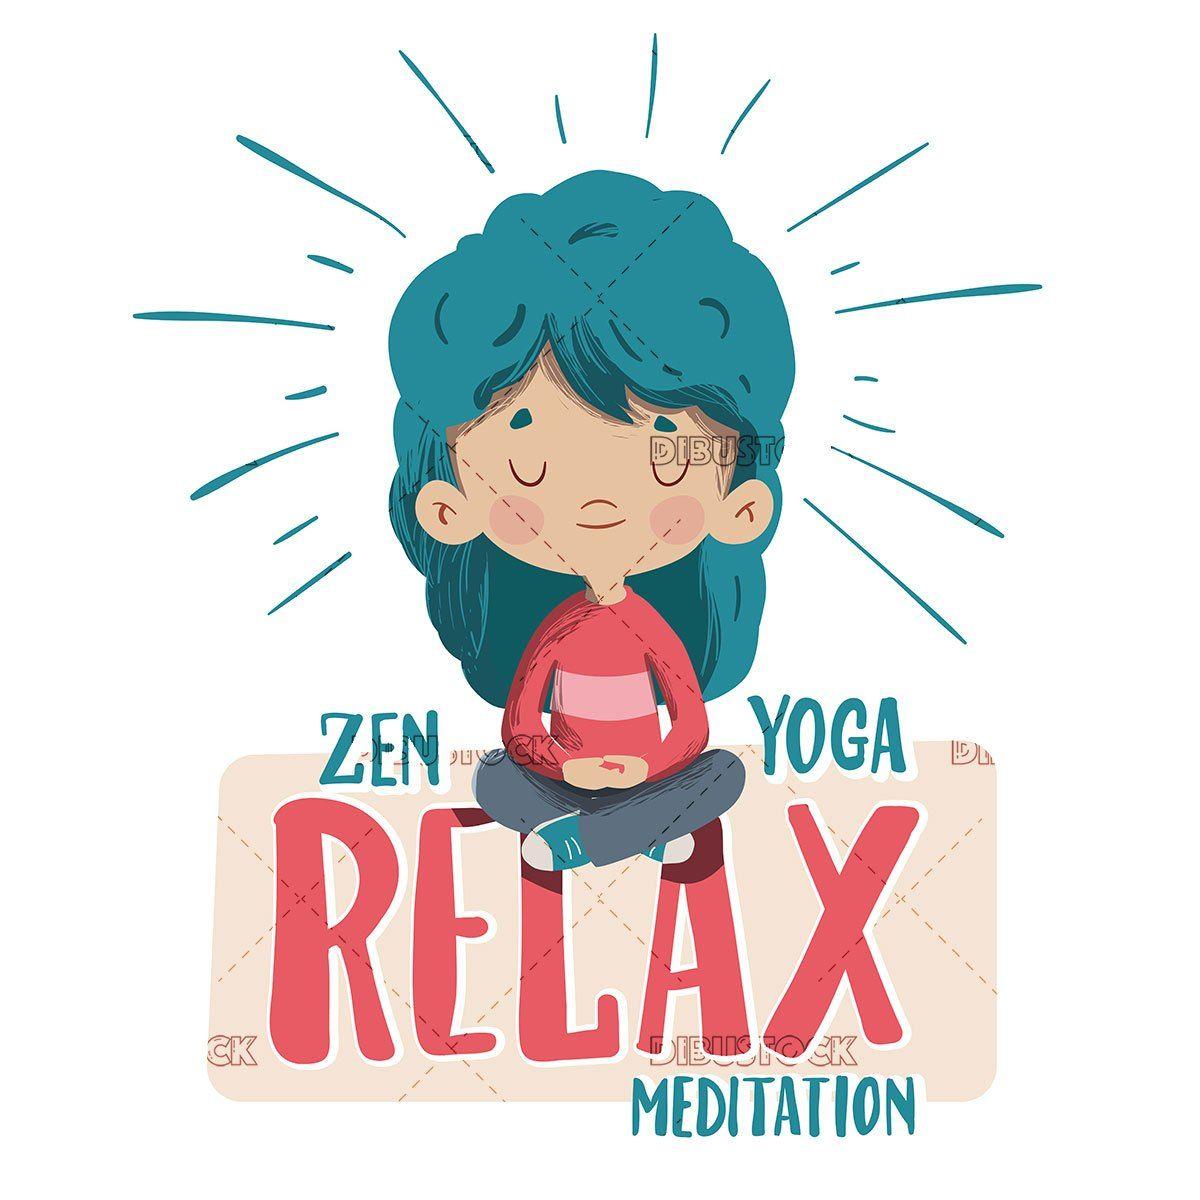 Girl Meditating Doing Yoga In